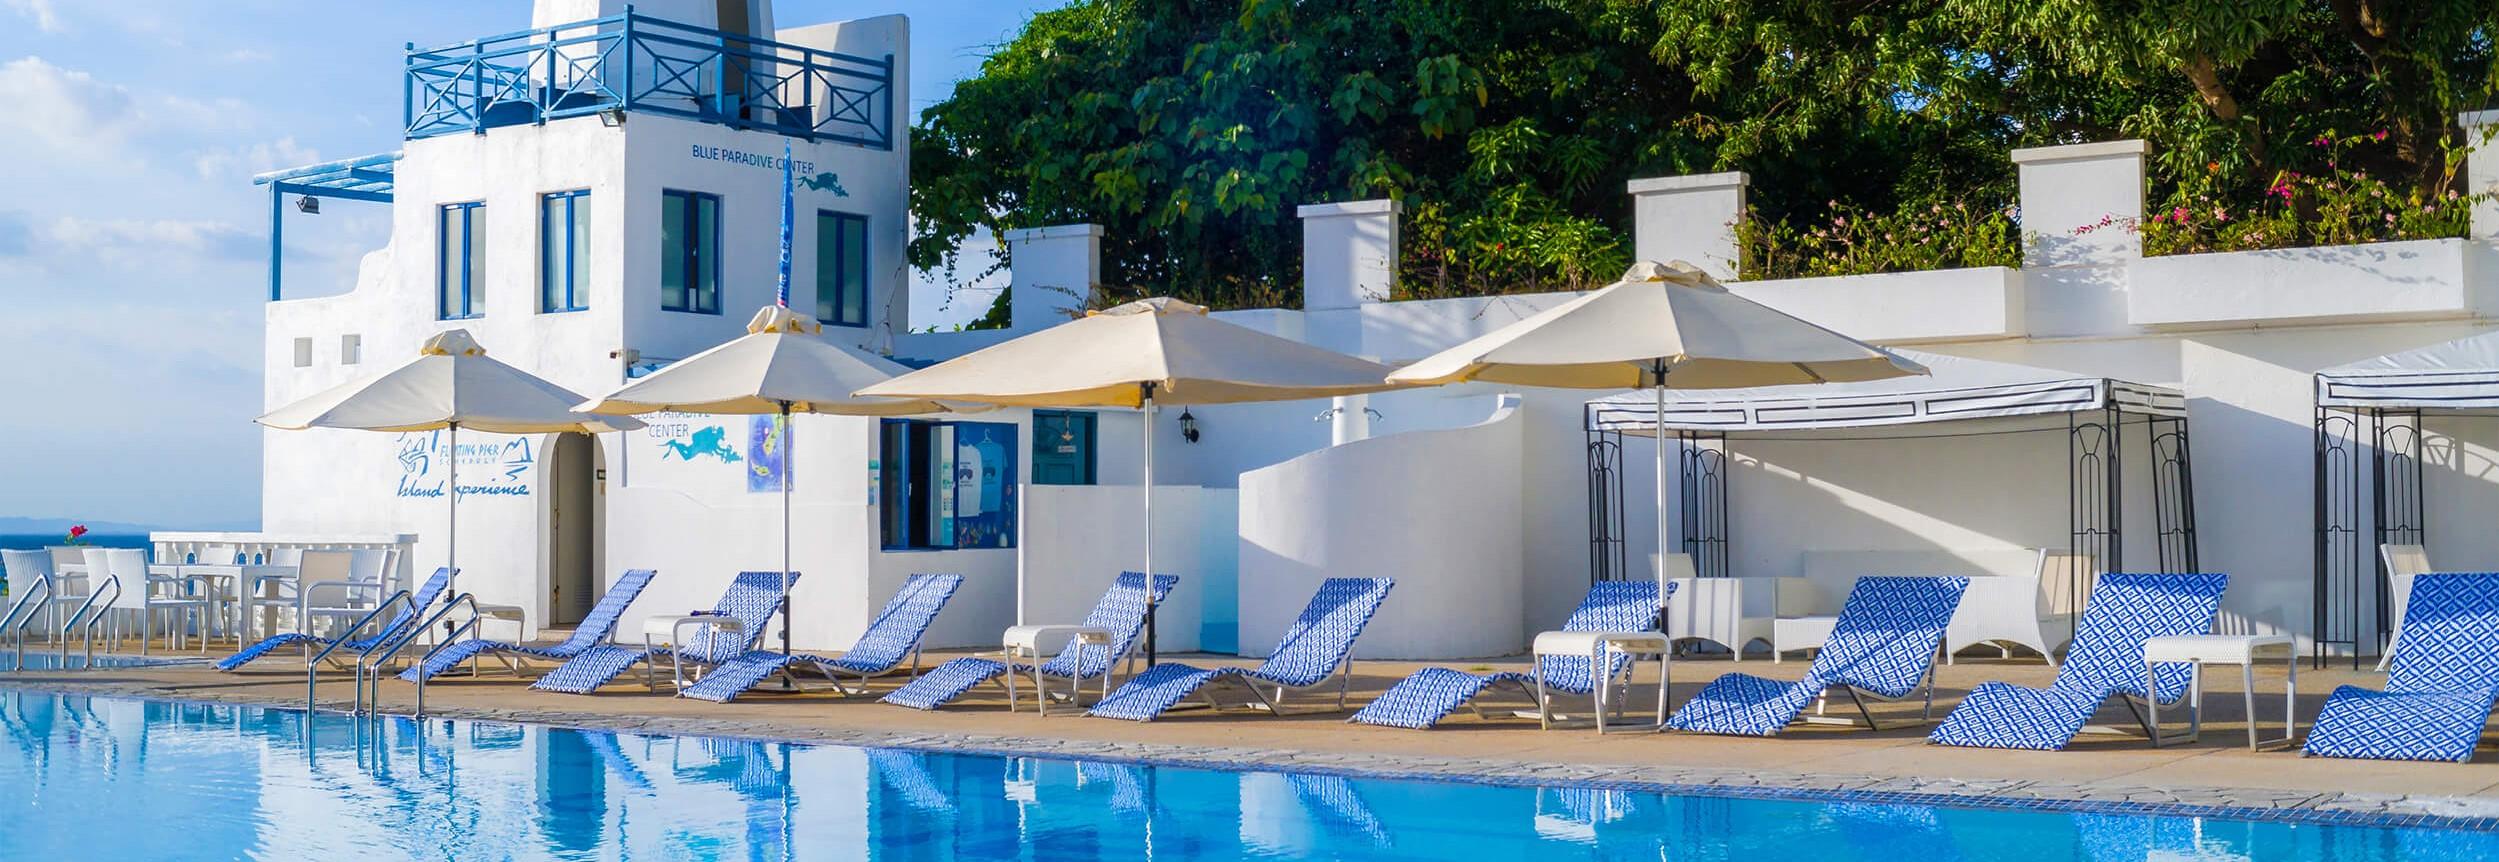 11 Best Santorini-Like Resorts in the Philippines: Near Manila, Cebu, Palawan, Vigan